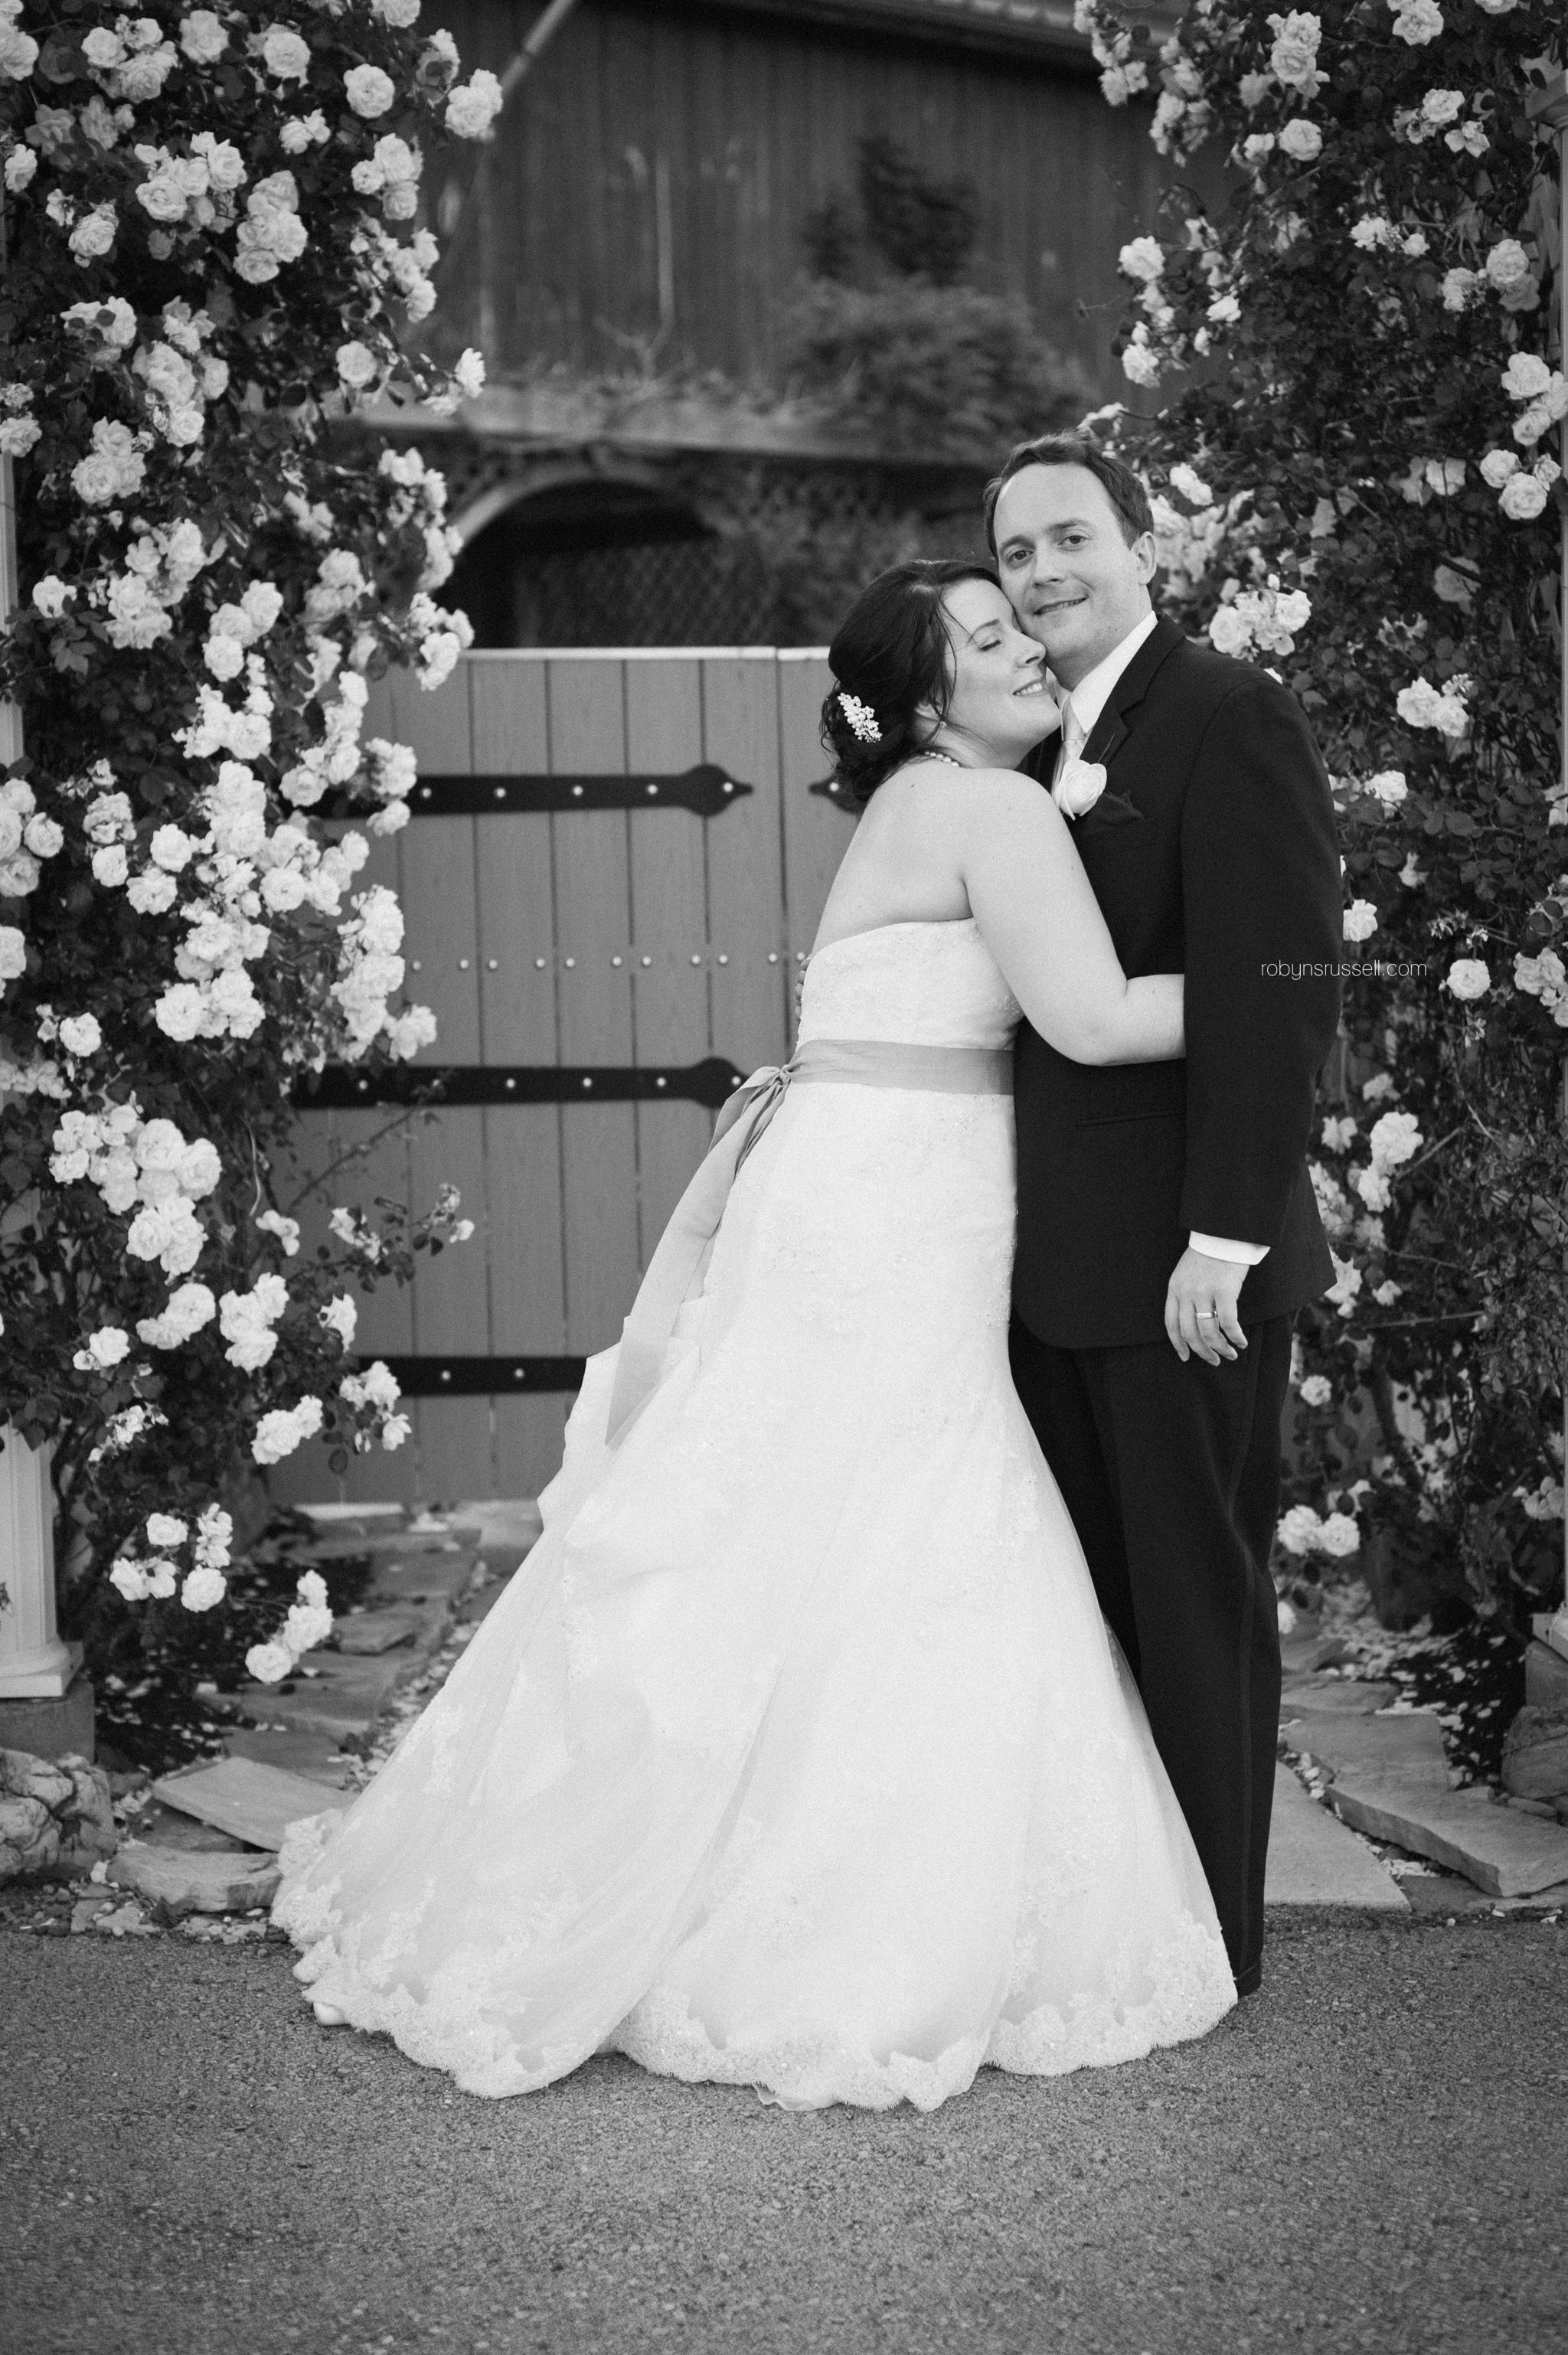 39-bride-and-groom-under-flower-arch.jpg